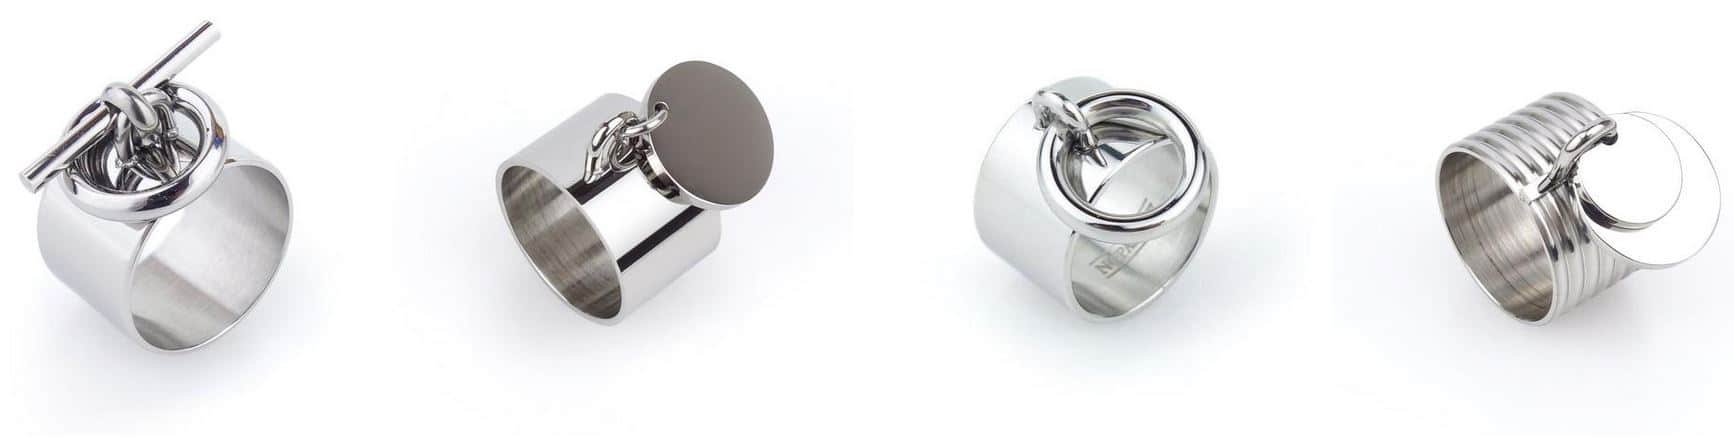 bijoux nopalace acier inoxydable